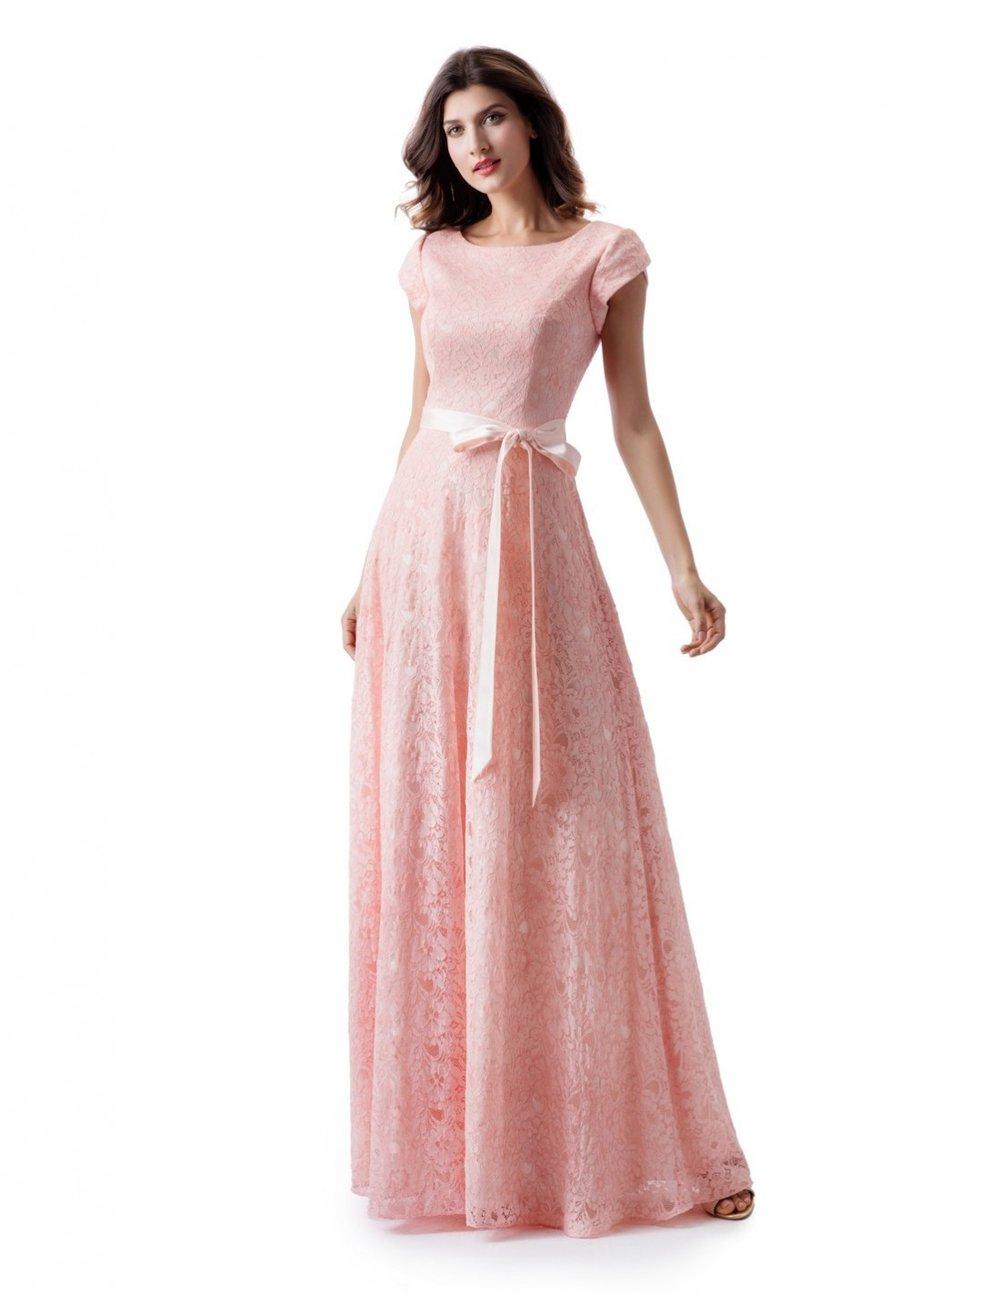 Venus TM1822 Ice Pink Modest Prom